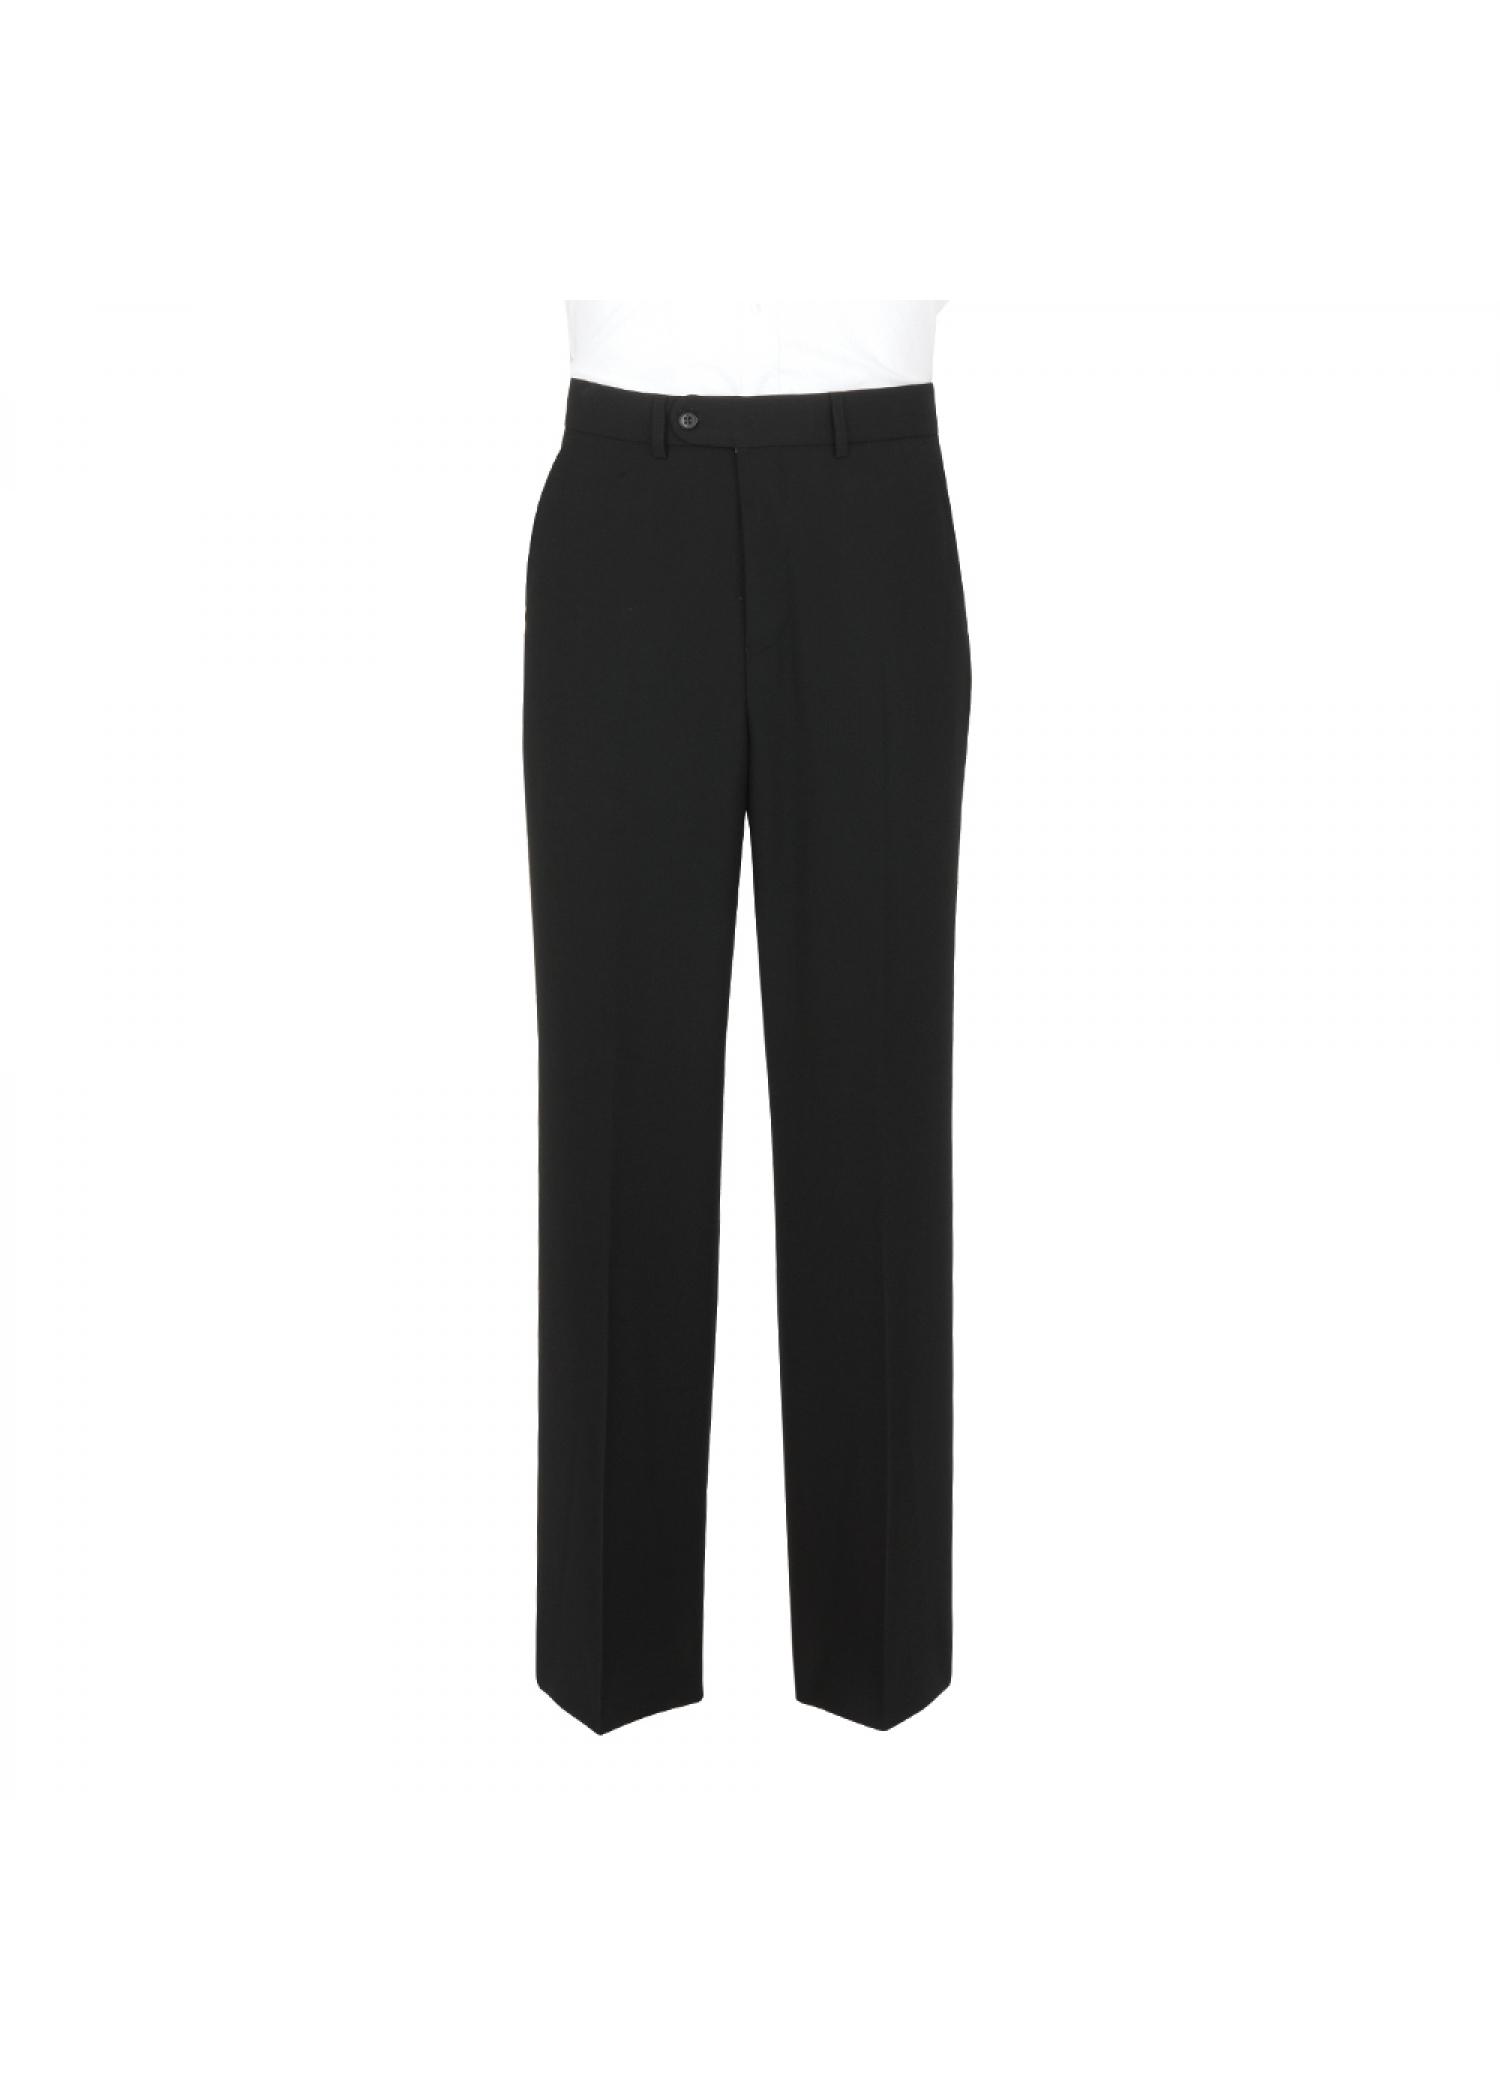 Wool Mix Black Trousers